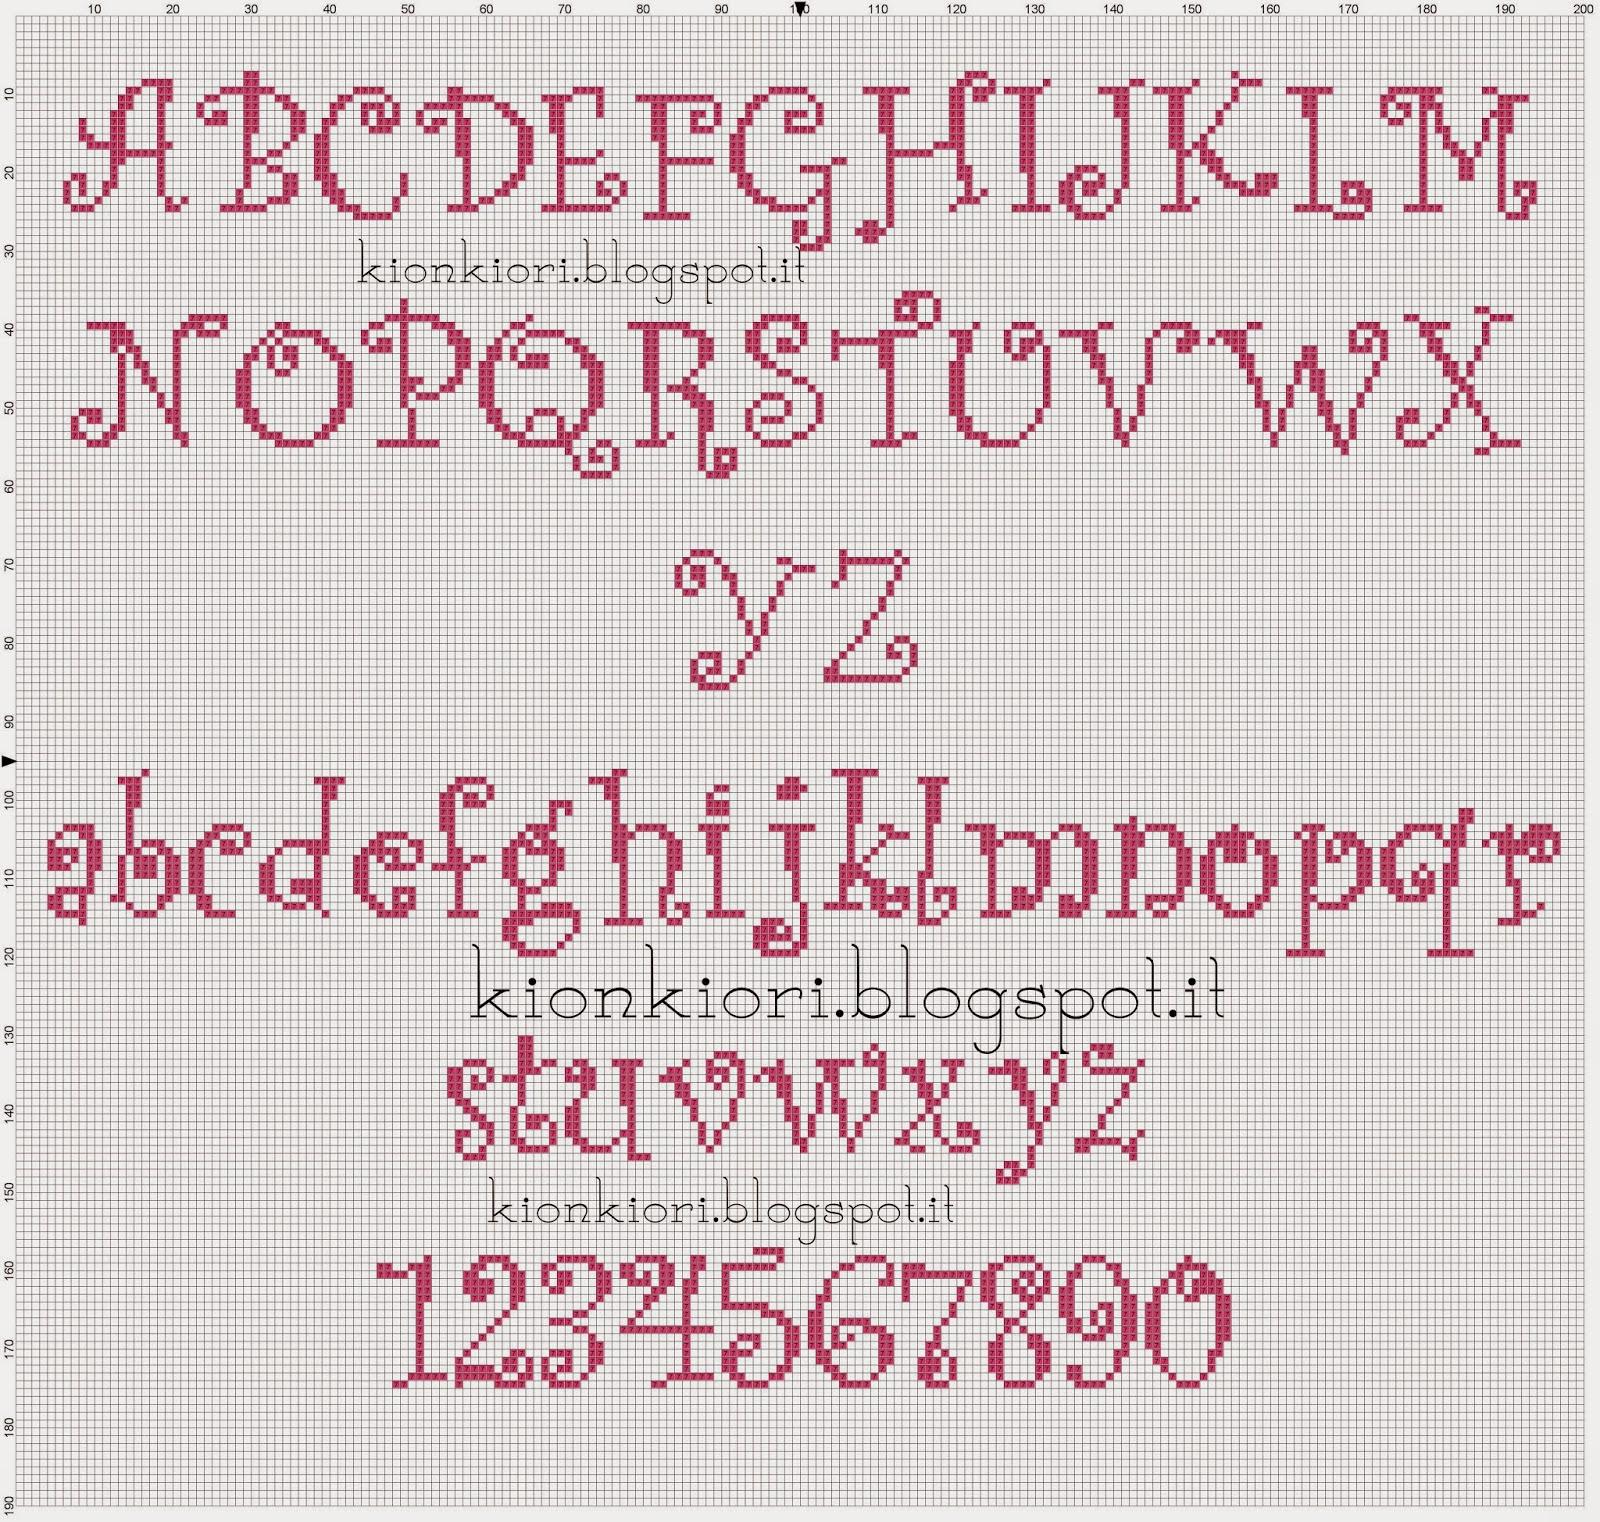 Favoloso KIONKIORI Punto Croce: Un, Due, Tre Alfabeti !! QS22